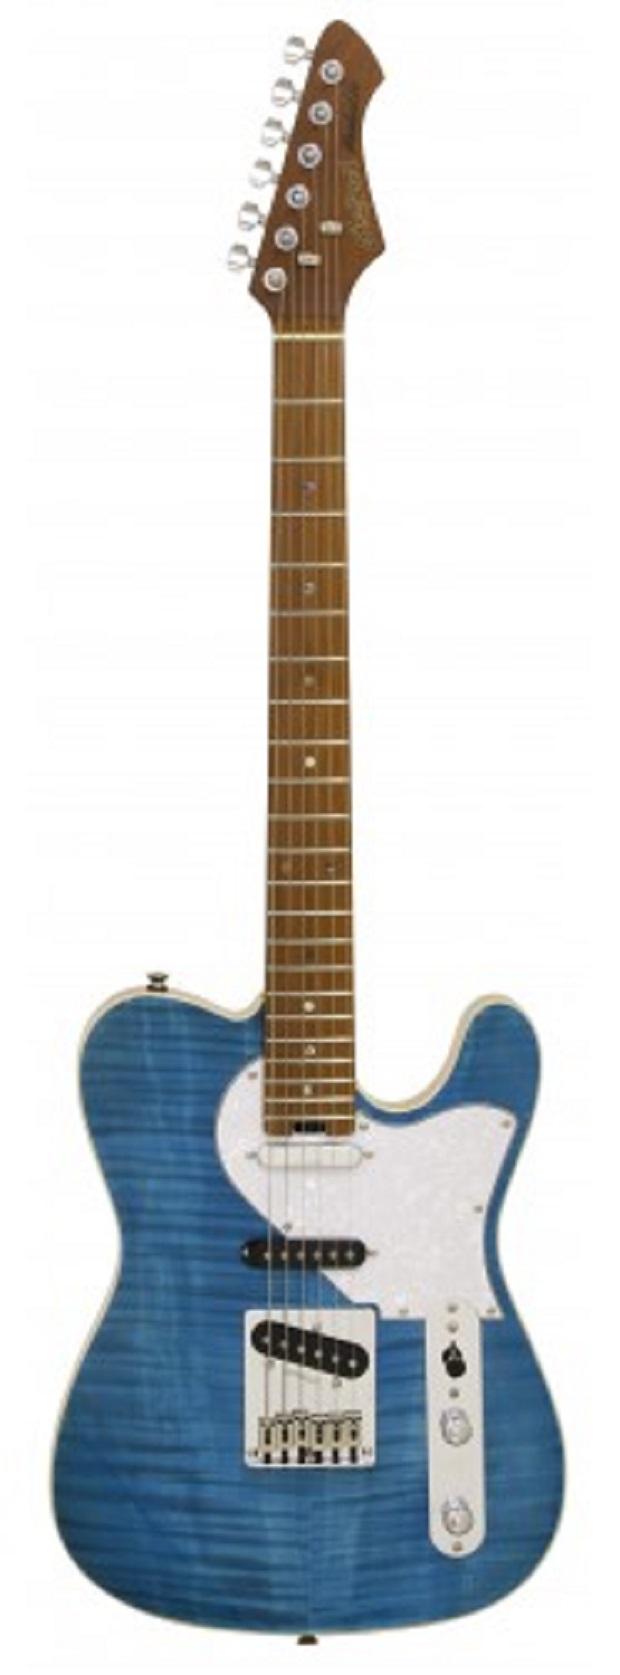 Aria 615MKII-TQBL Nashville Turquoise Blue Electric Guitar